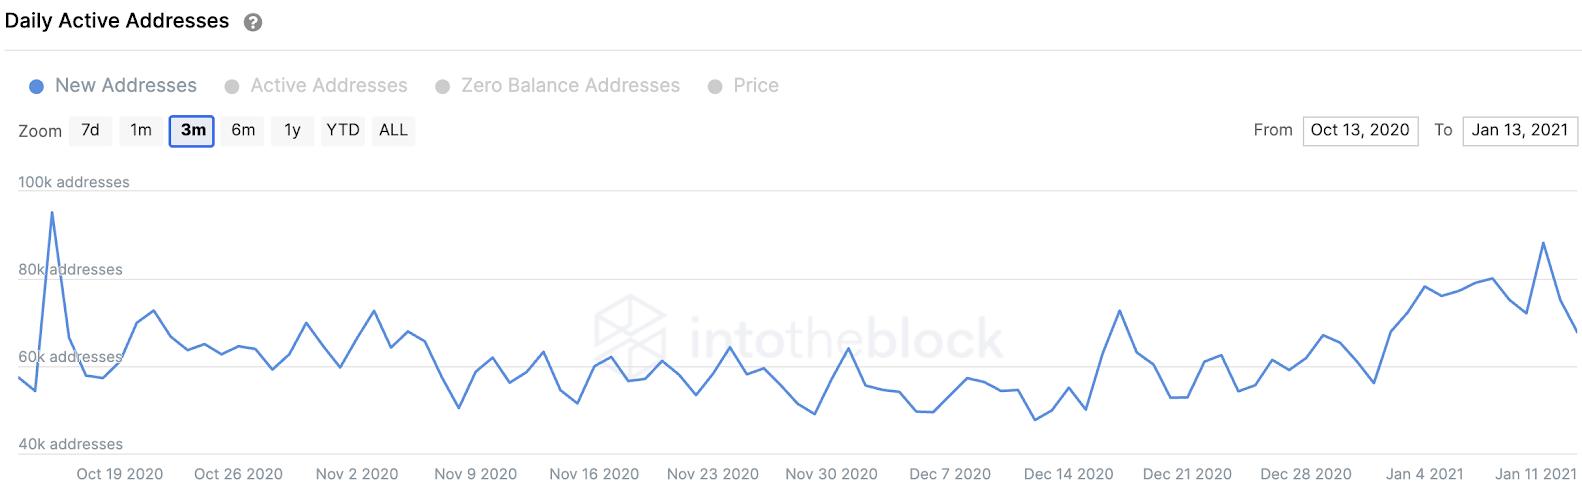 litecoin addresses chart 011421